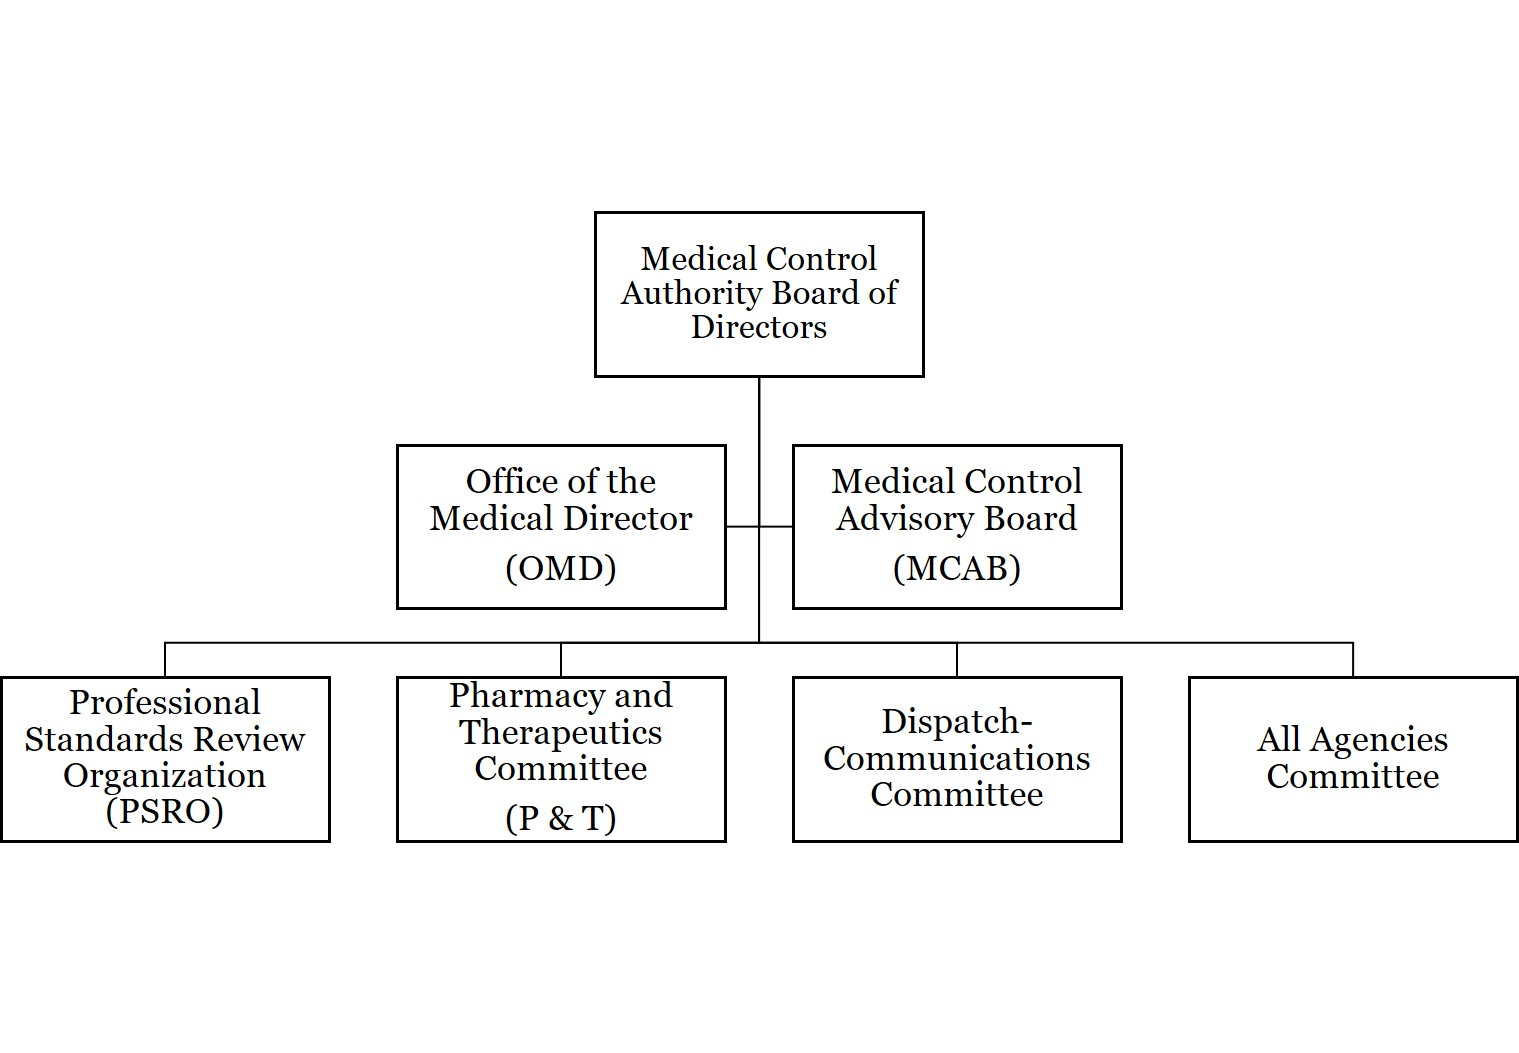 Organizational Chart for website - 18-07-31.jpg